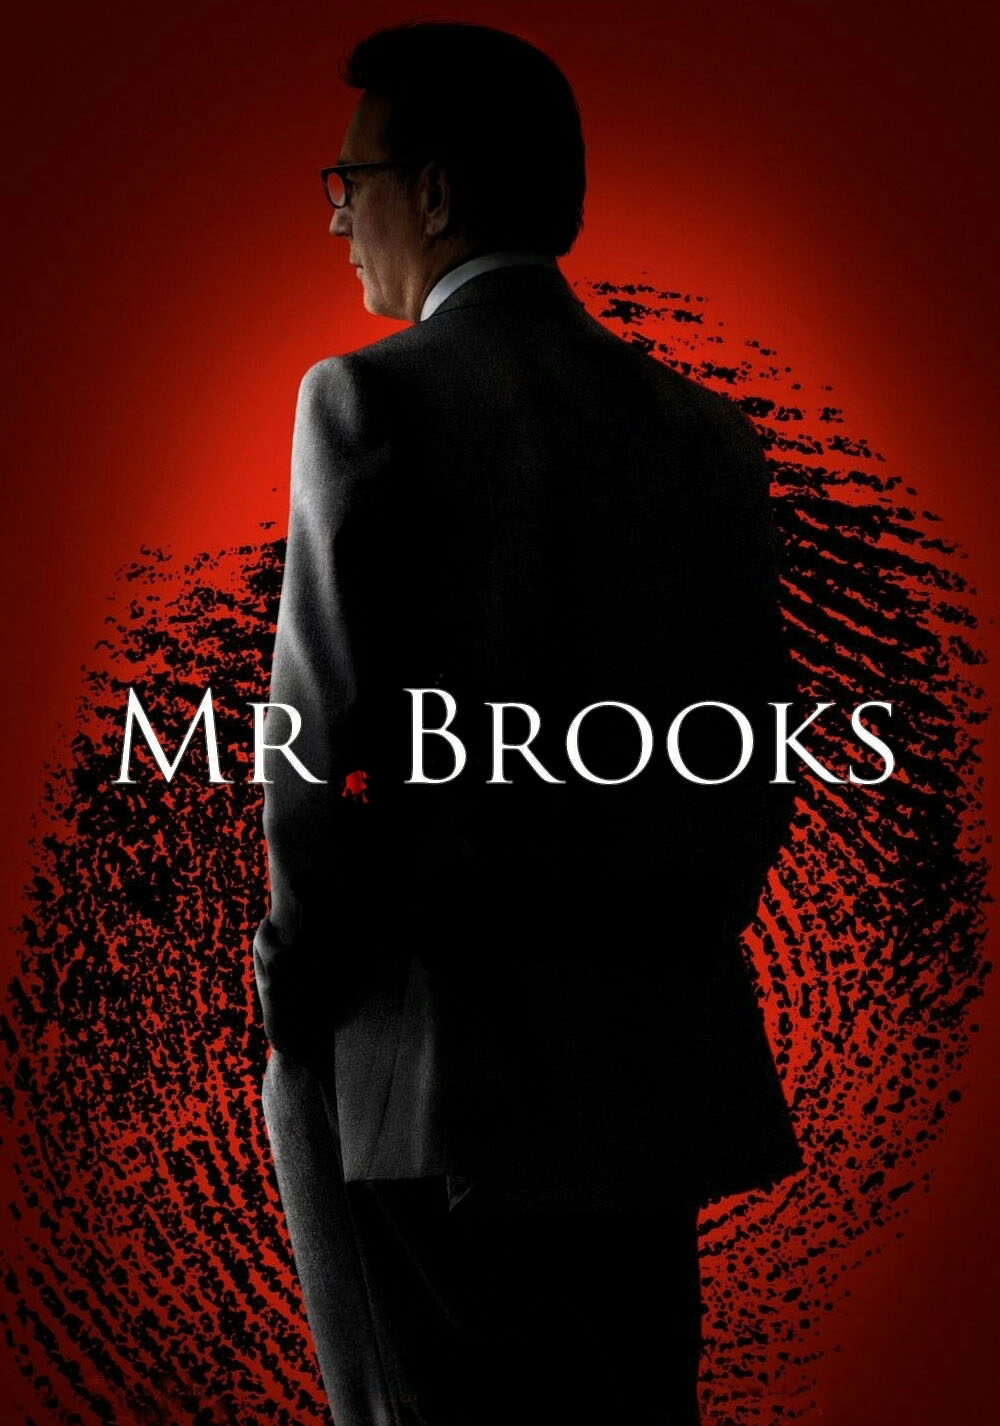 Mr. Brooks | Movie fanart | fanart.tv